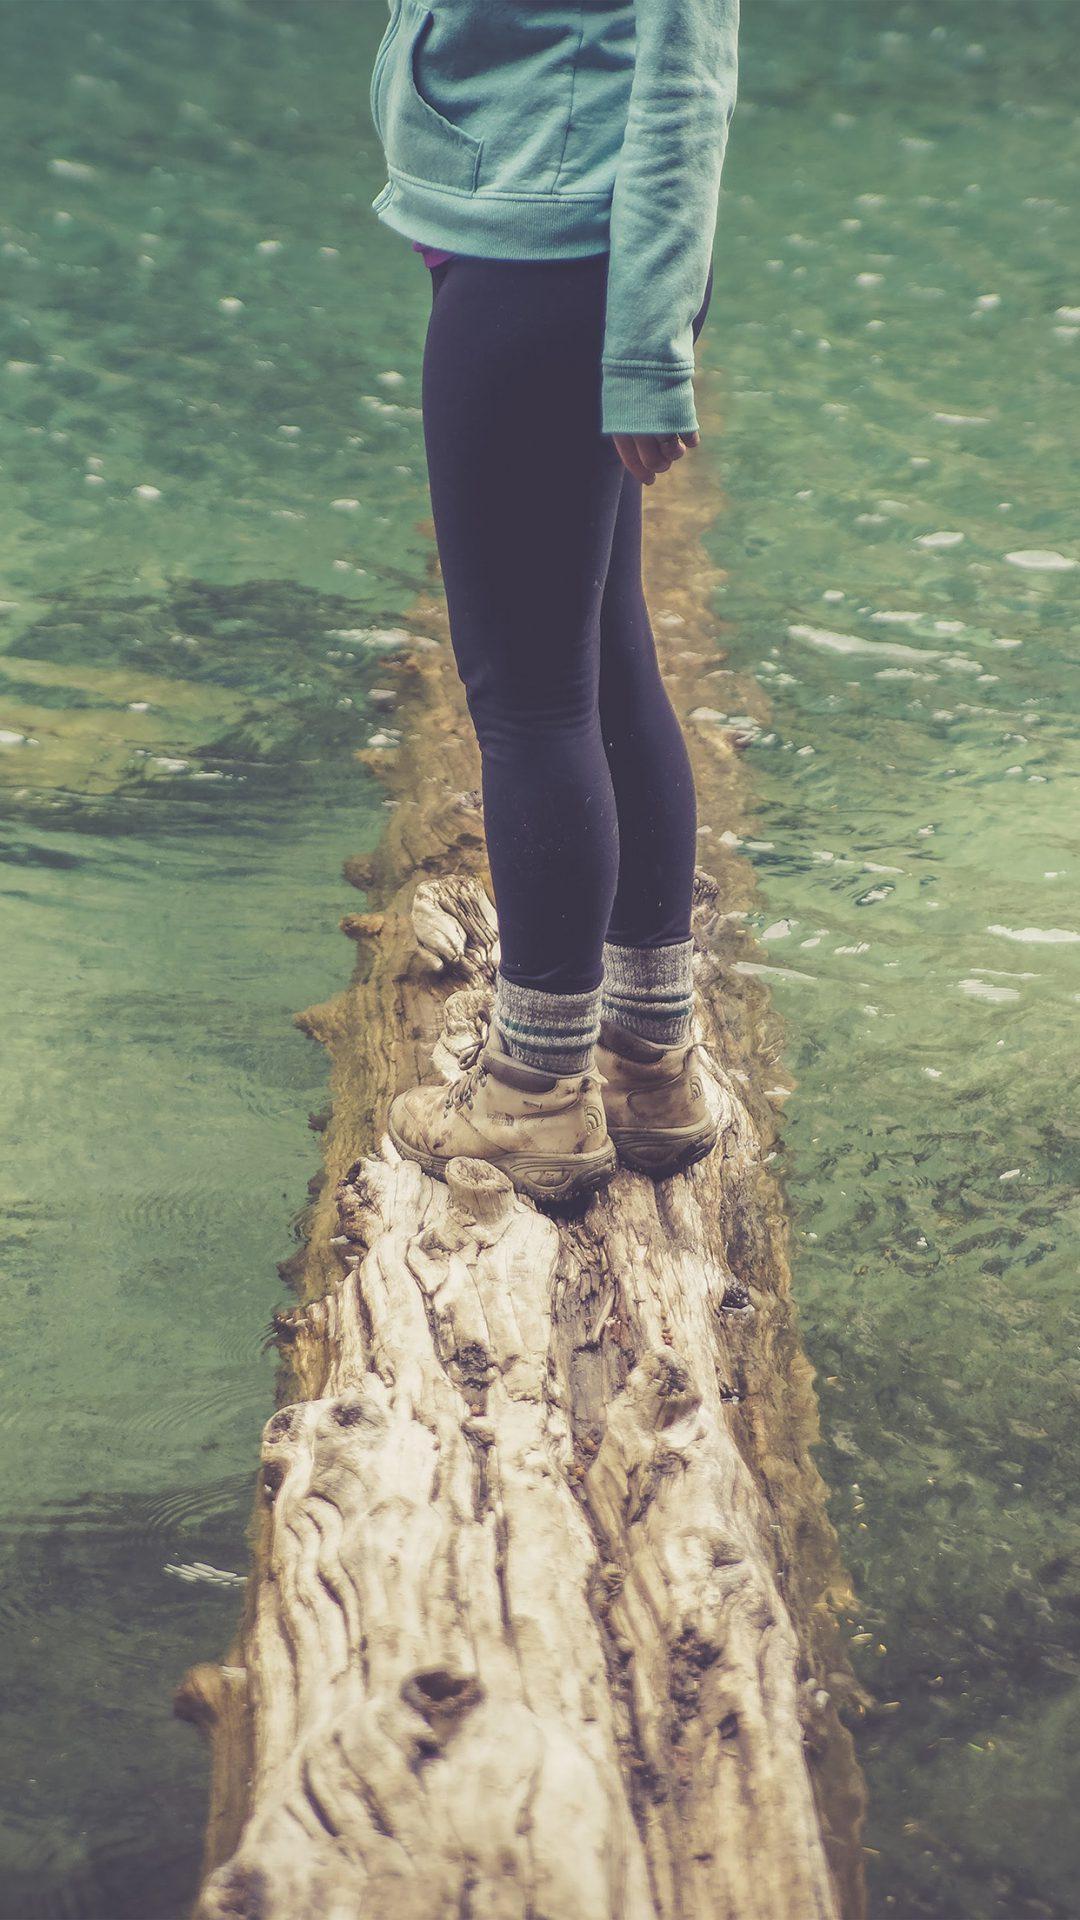 Girlfriend Lake Green Nature Water Cold